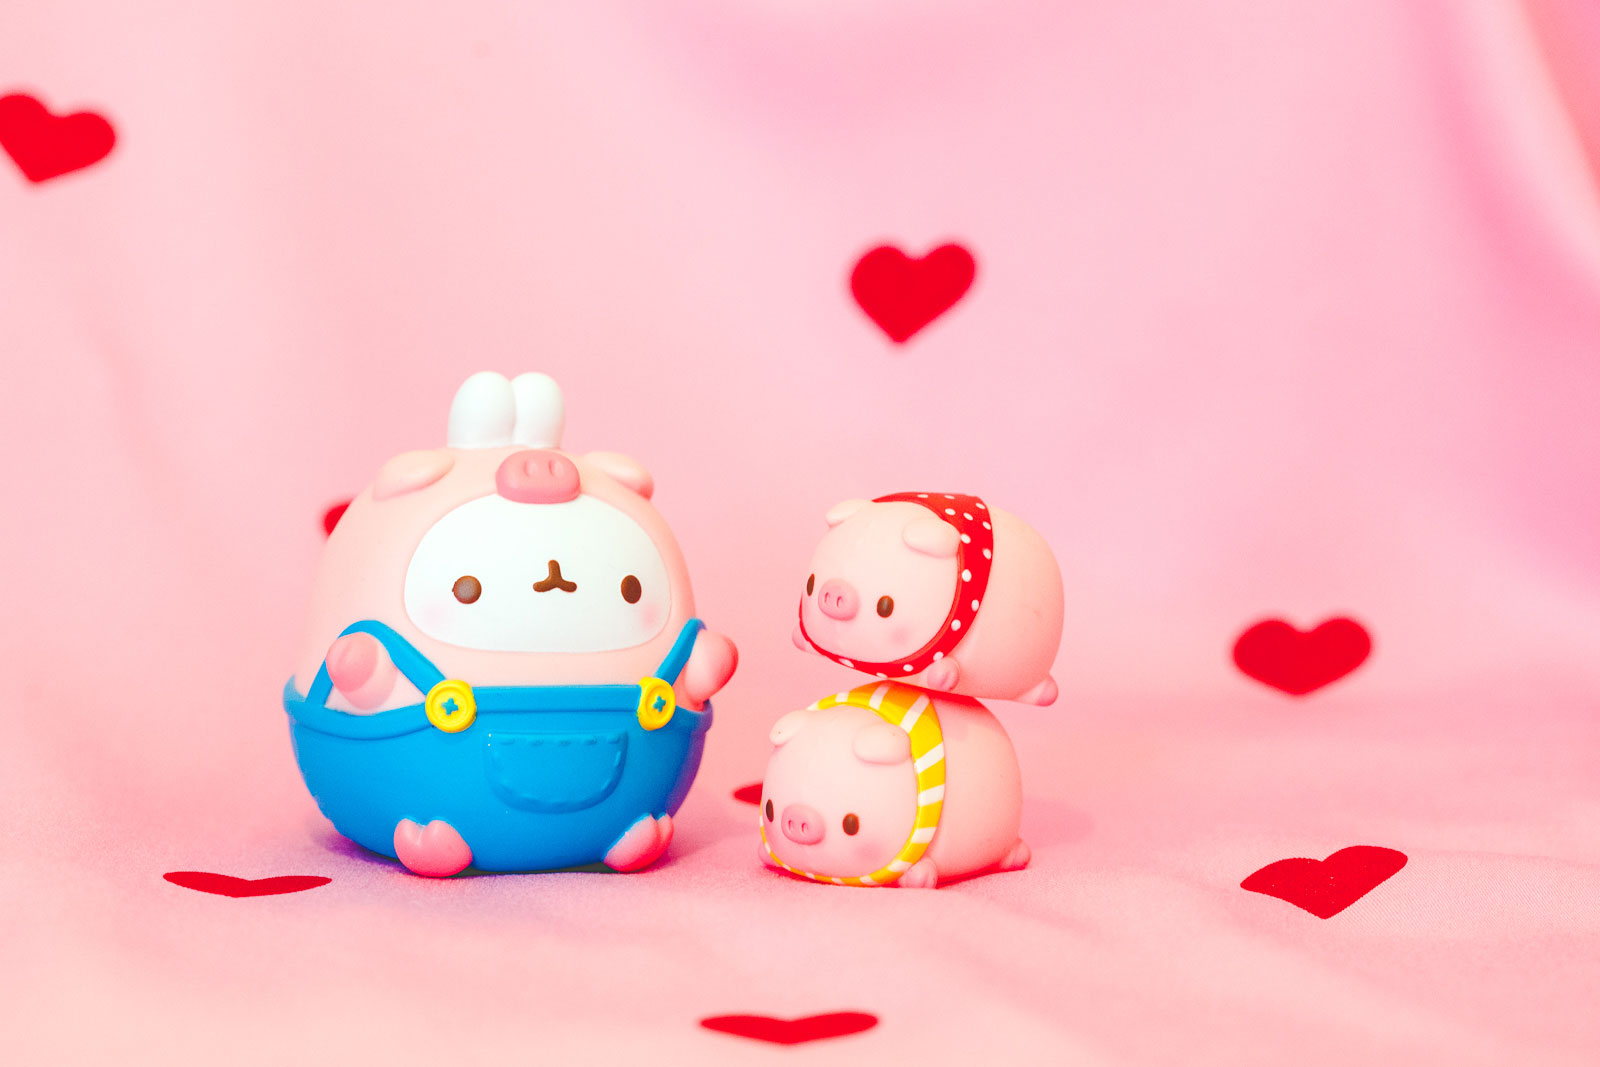 ninaah bulles, beauté, saint valentin, soins, molang